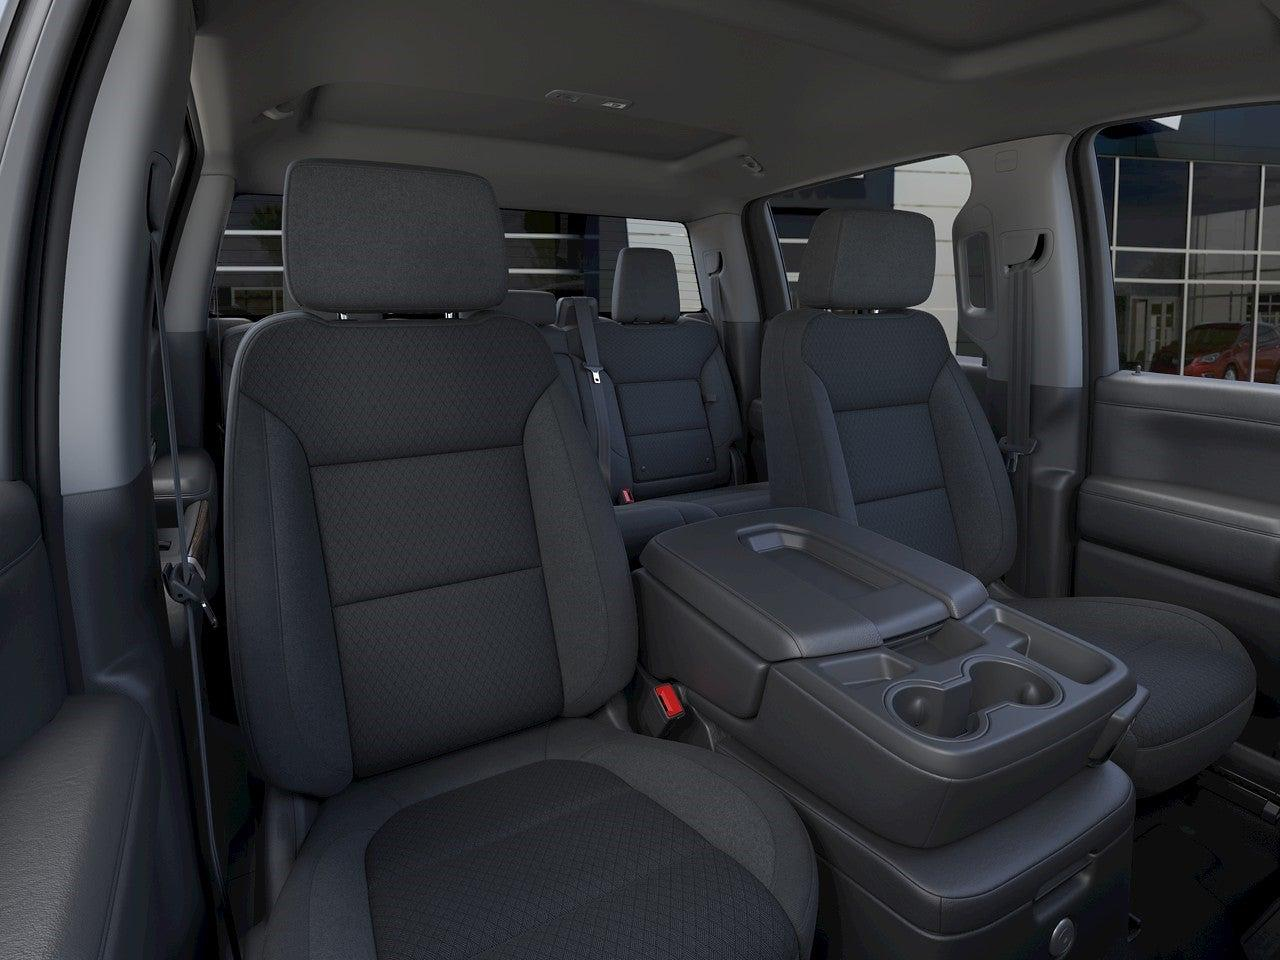 2021 GMC Sierra 1500 Crew Cab 4x4, Pickup #V21220 - photo 33